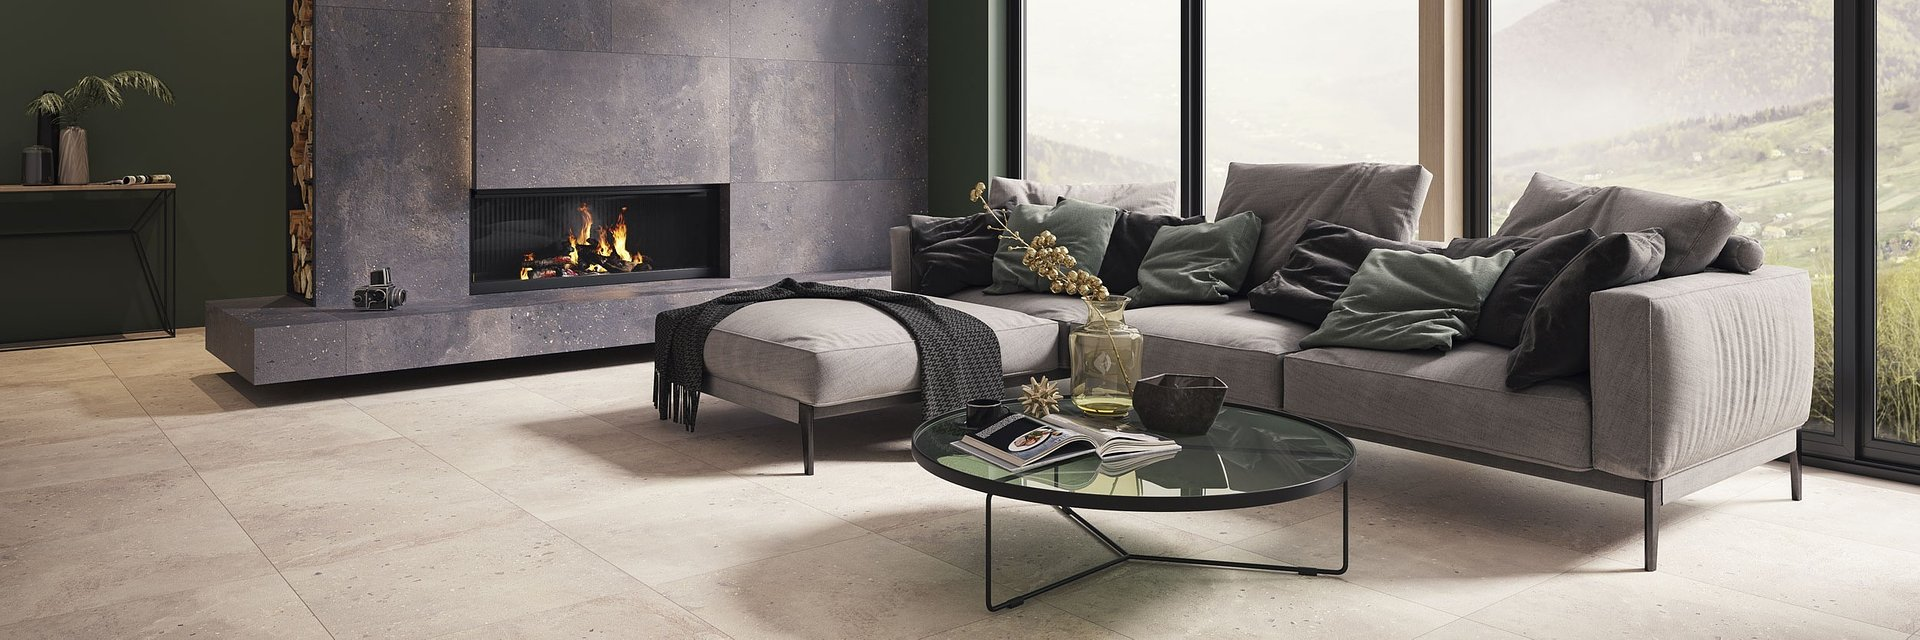 Desertdust, Industrialdust i Silkdust – nowe kolekcje Ceramiki Paradyż inspirowane betonem